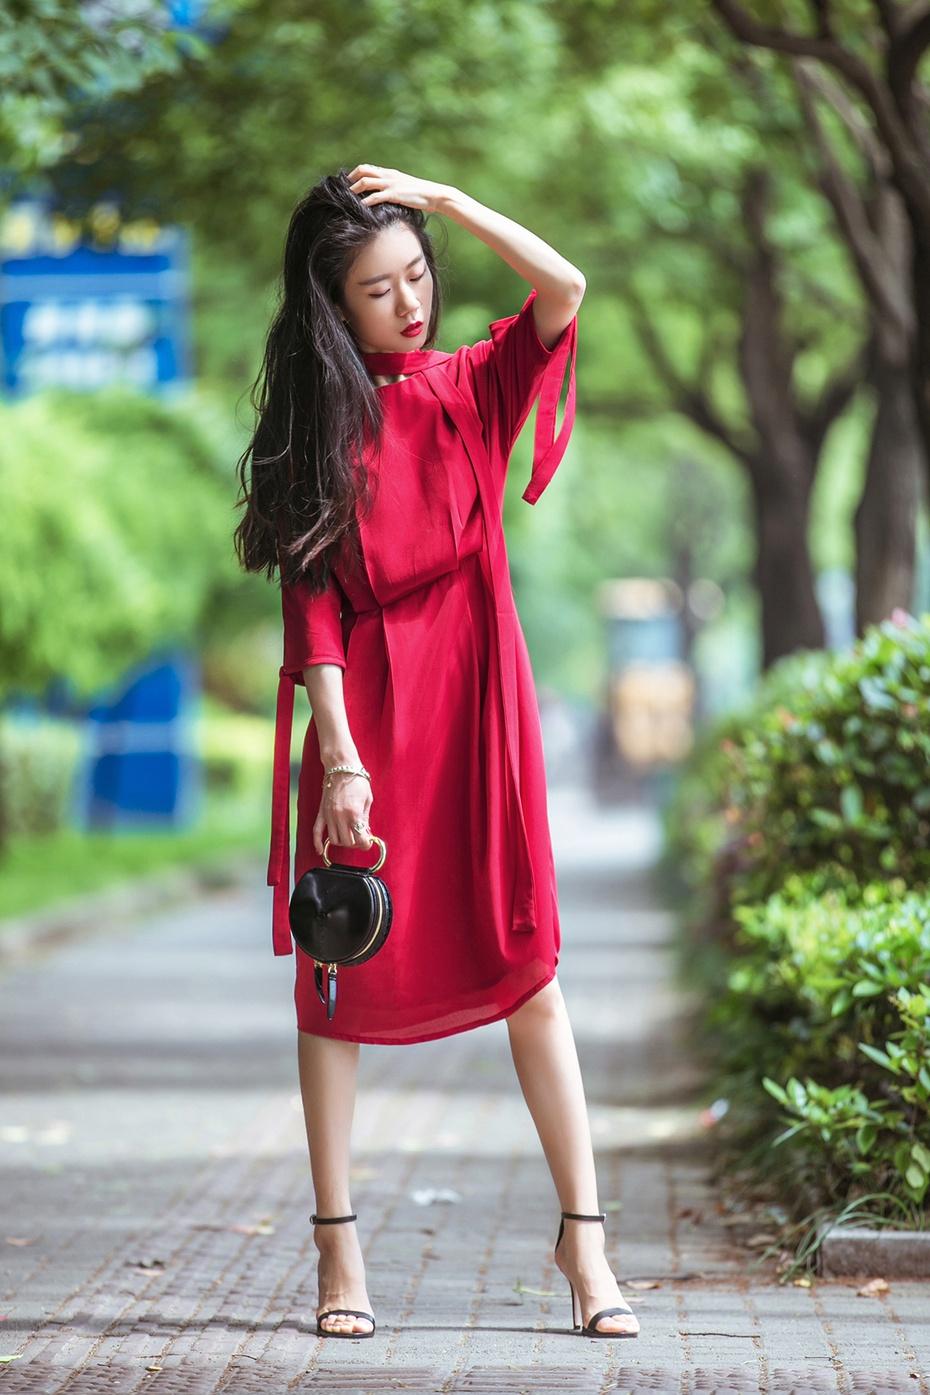 [Ava搭配日记]一条连衣裙N种穿法 - AvaFoo - Avas Fashion Blog